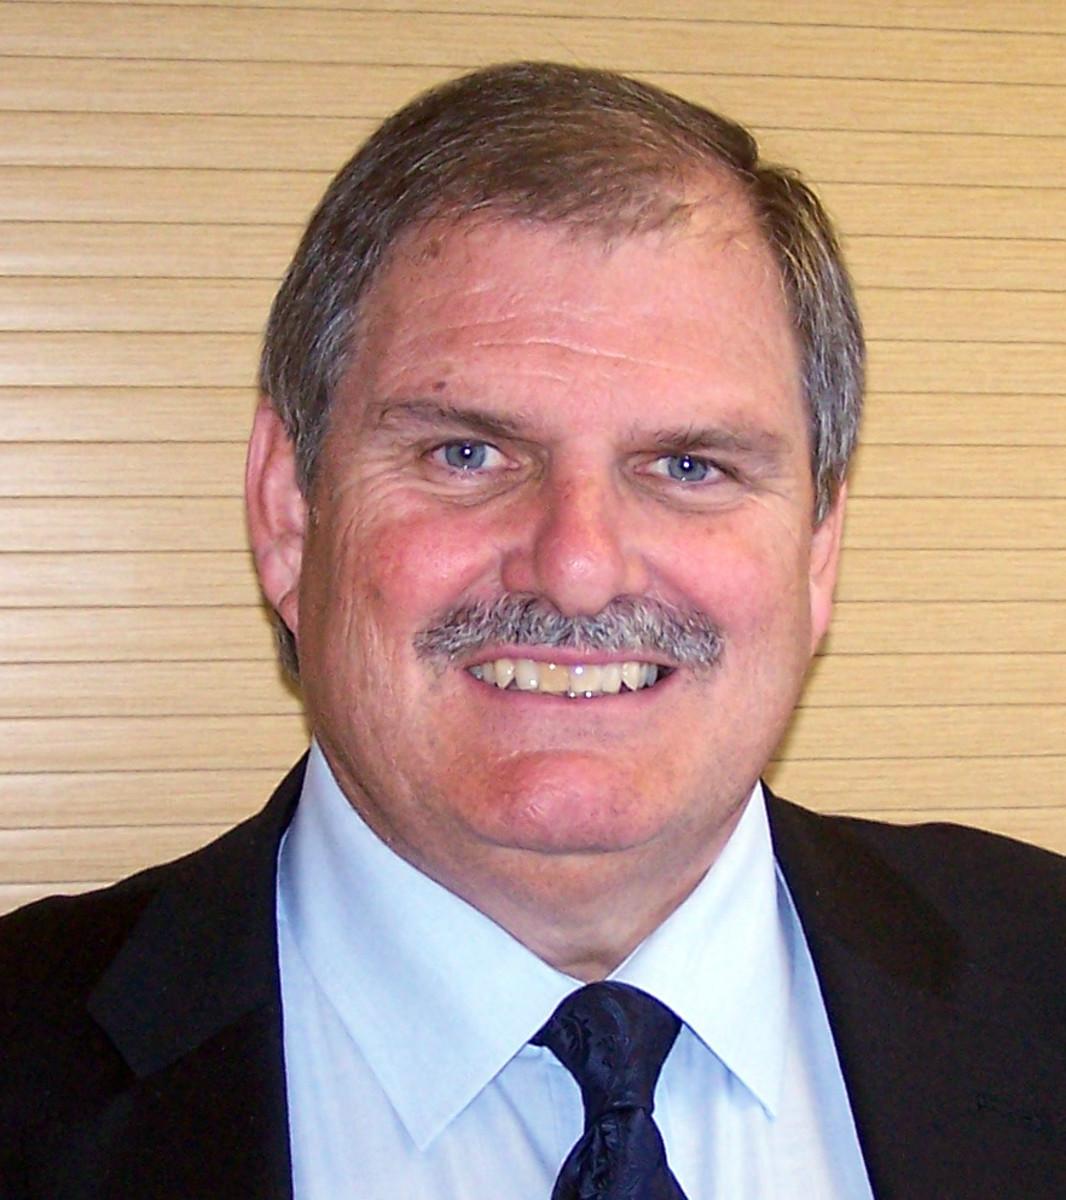 GMI Chairman Mick Bettesworth